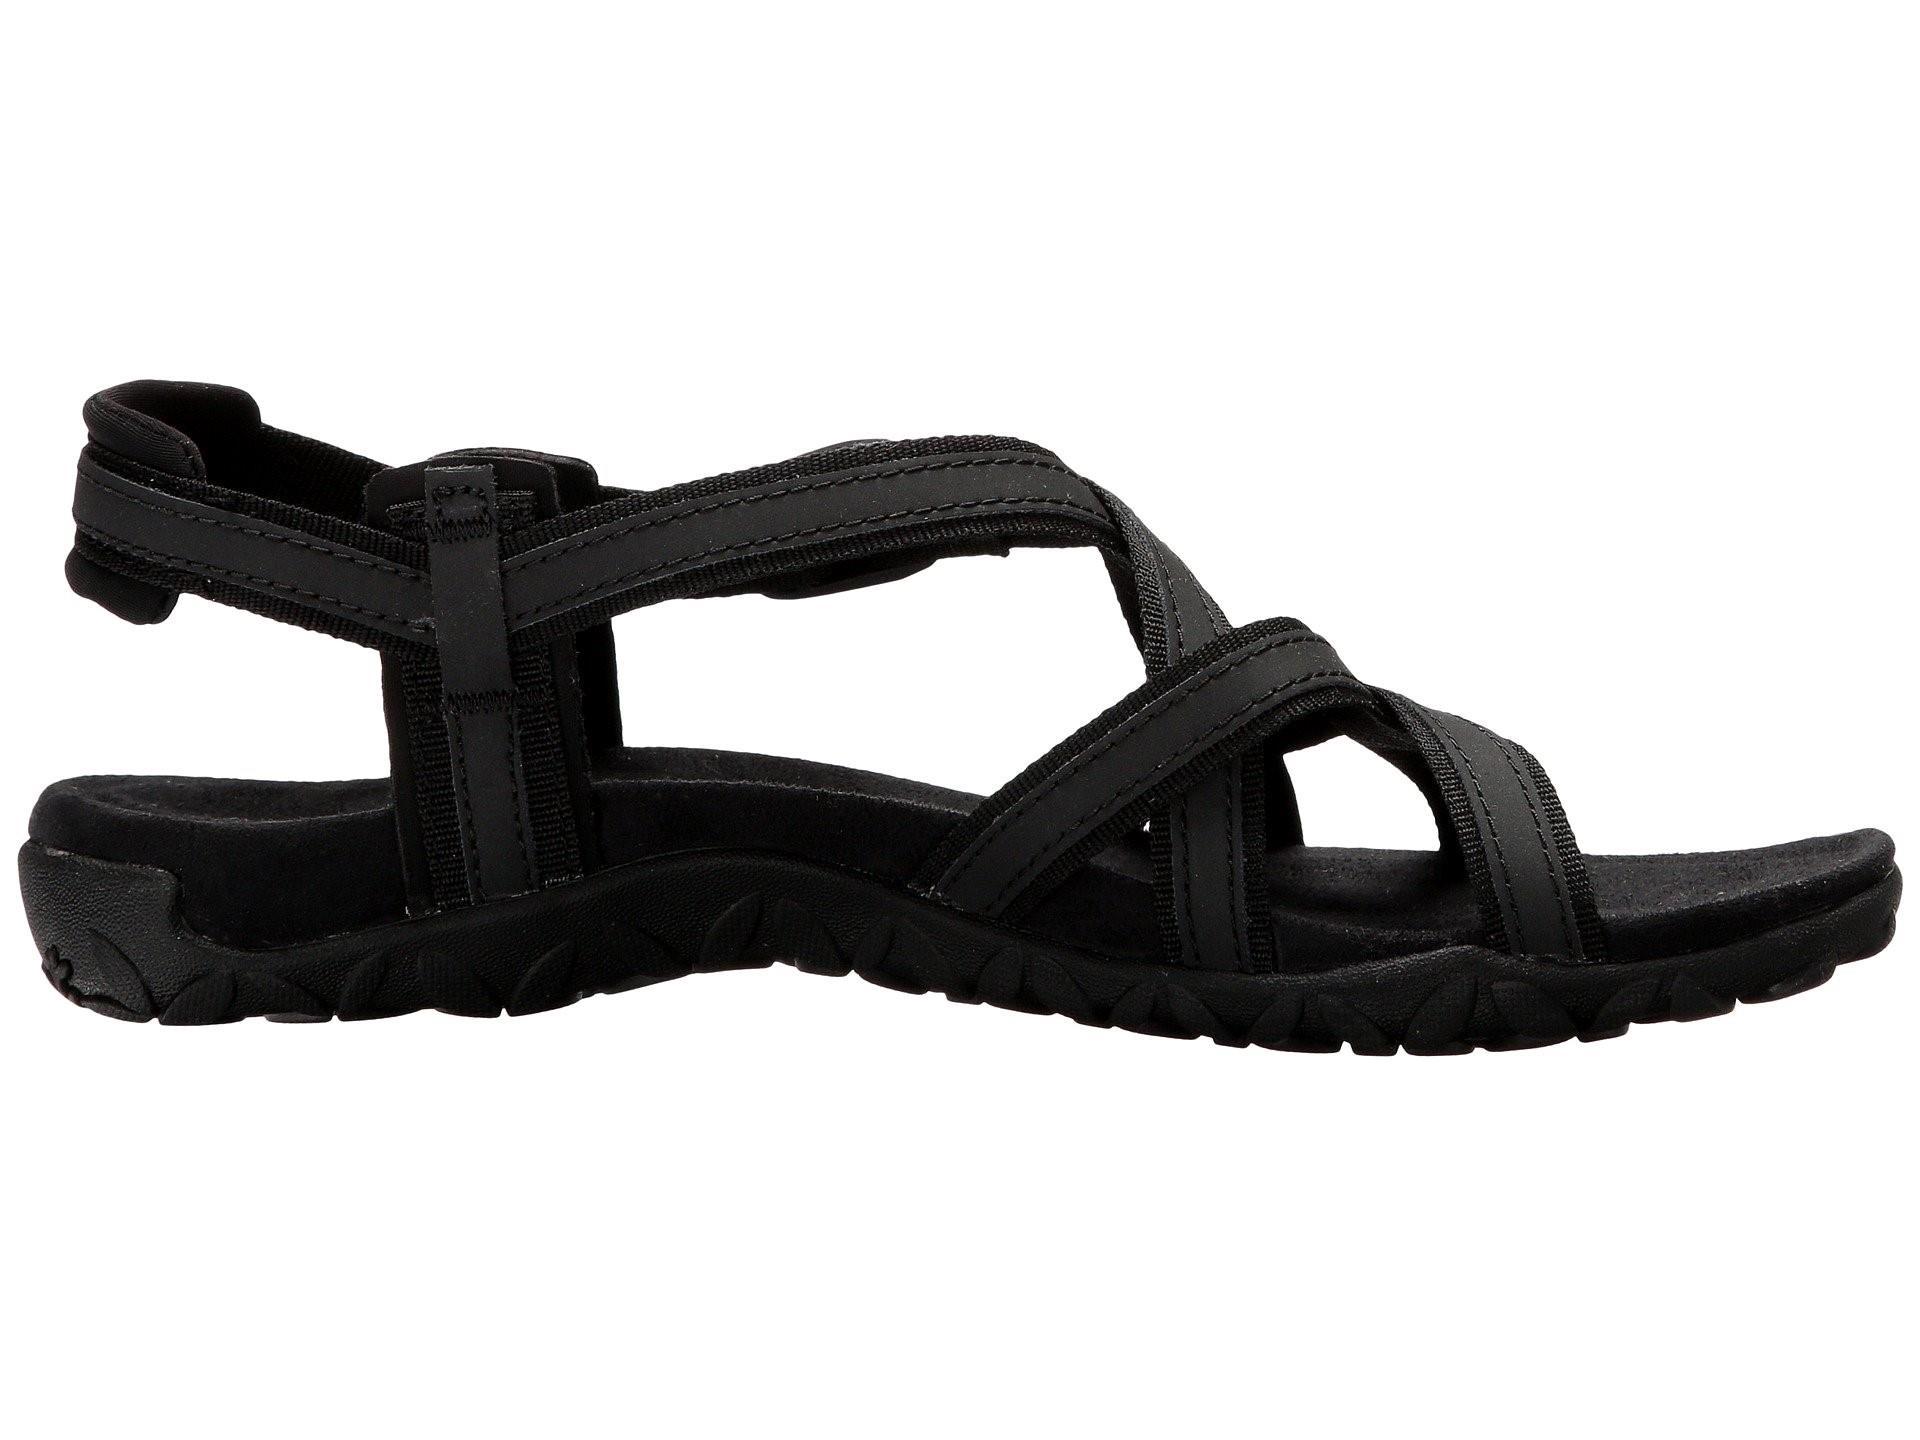 Merrell Terran Ari Lattice Sandalet J94020